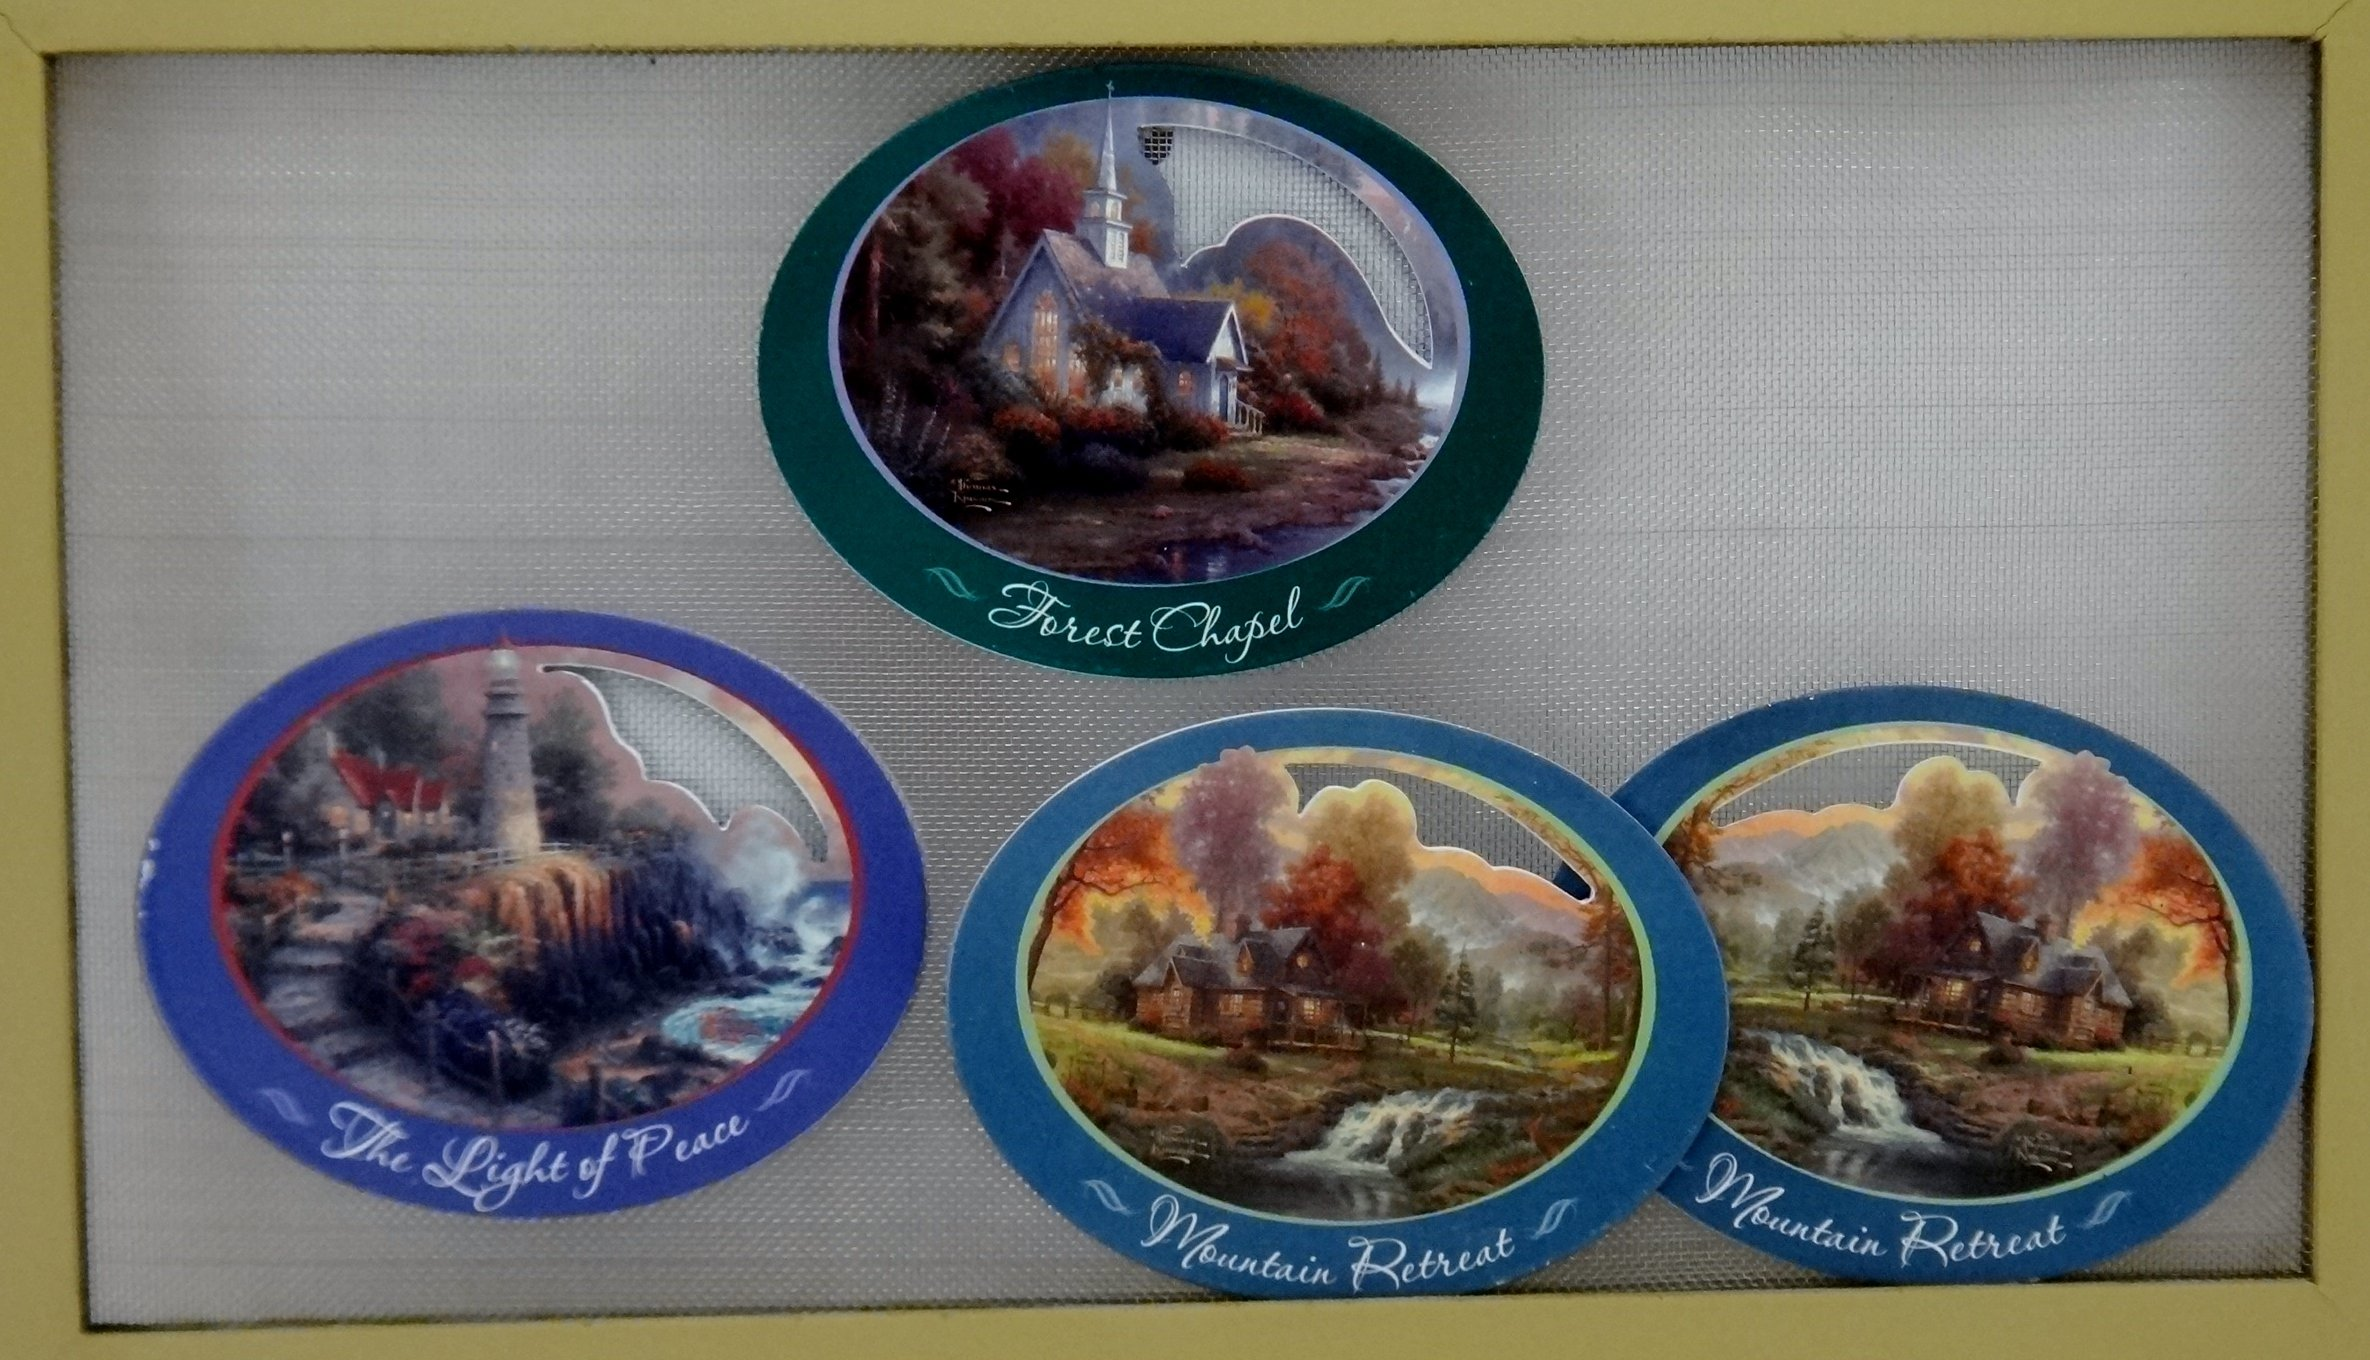 Thomas Kinkade Window/Patio Door Screen Saver Magnets - Set of 3: Forest Chapel, Mountain Retreat, The Light of Peace